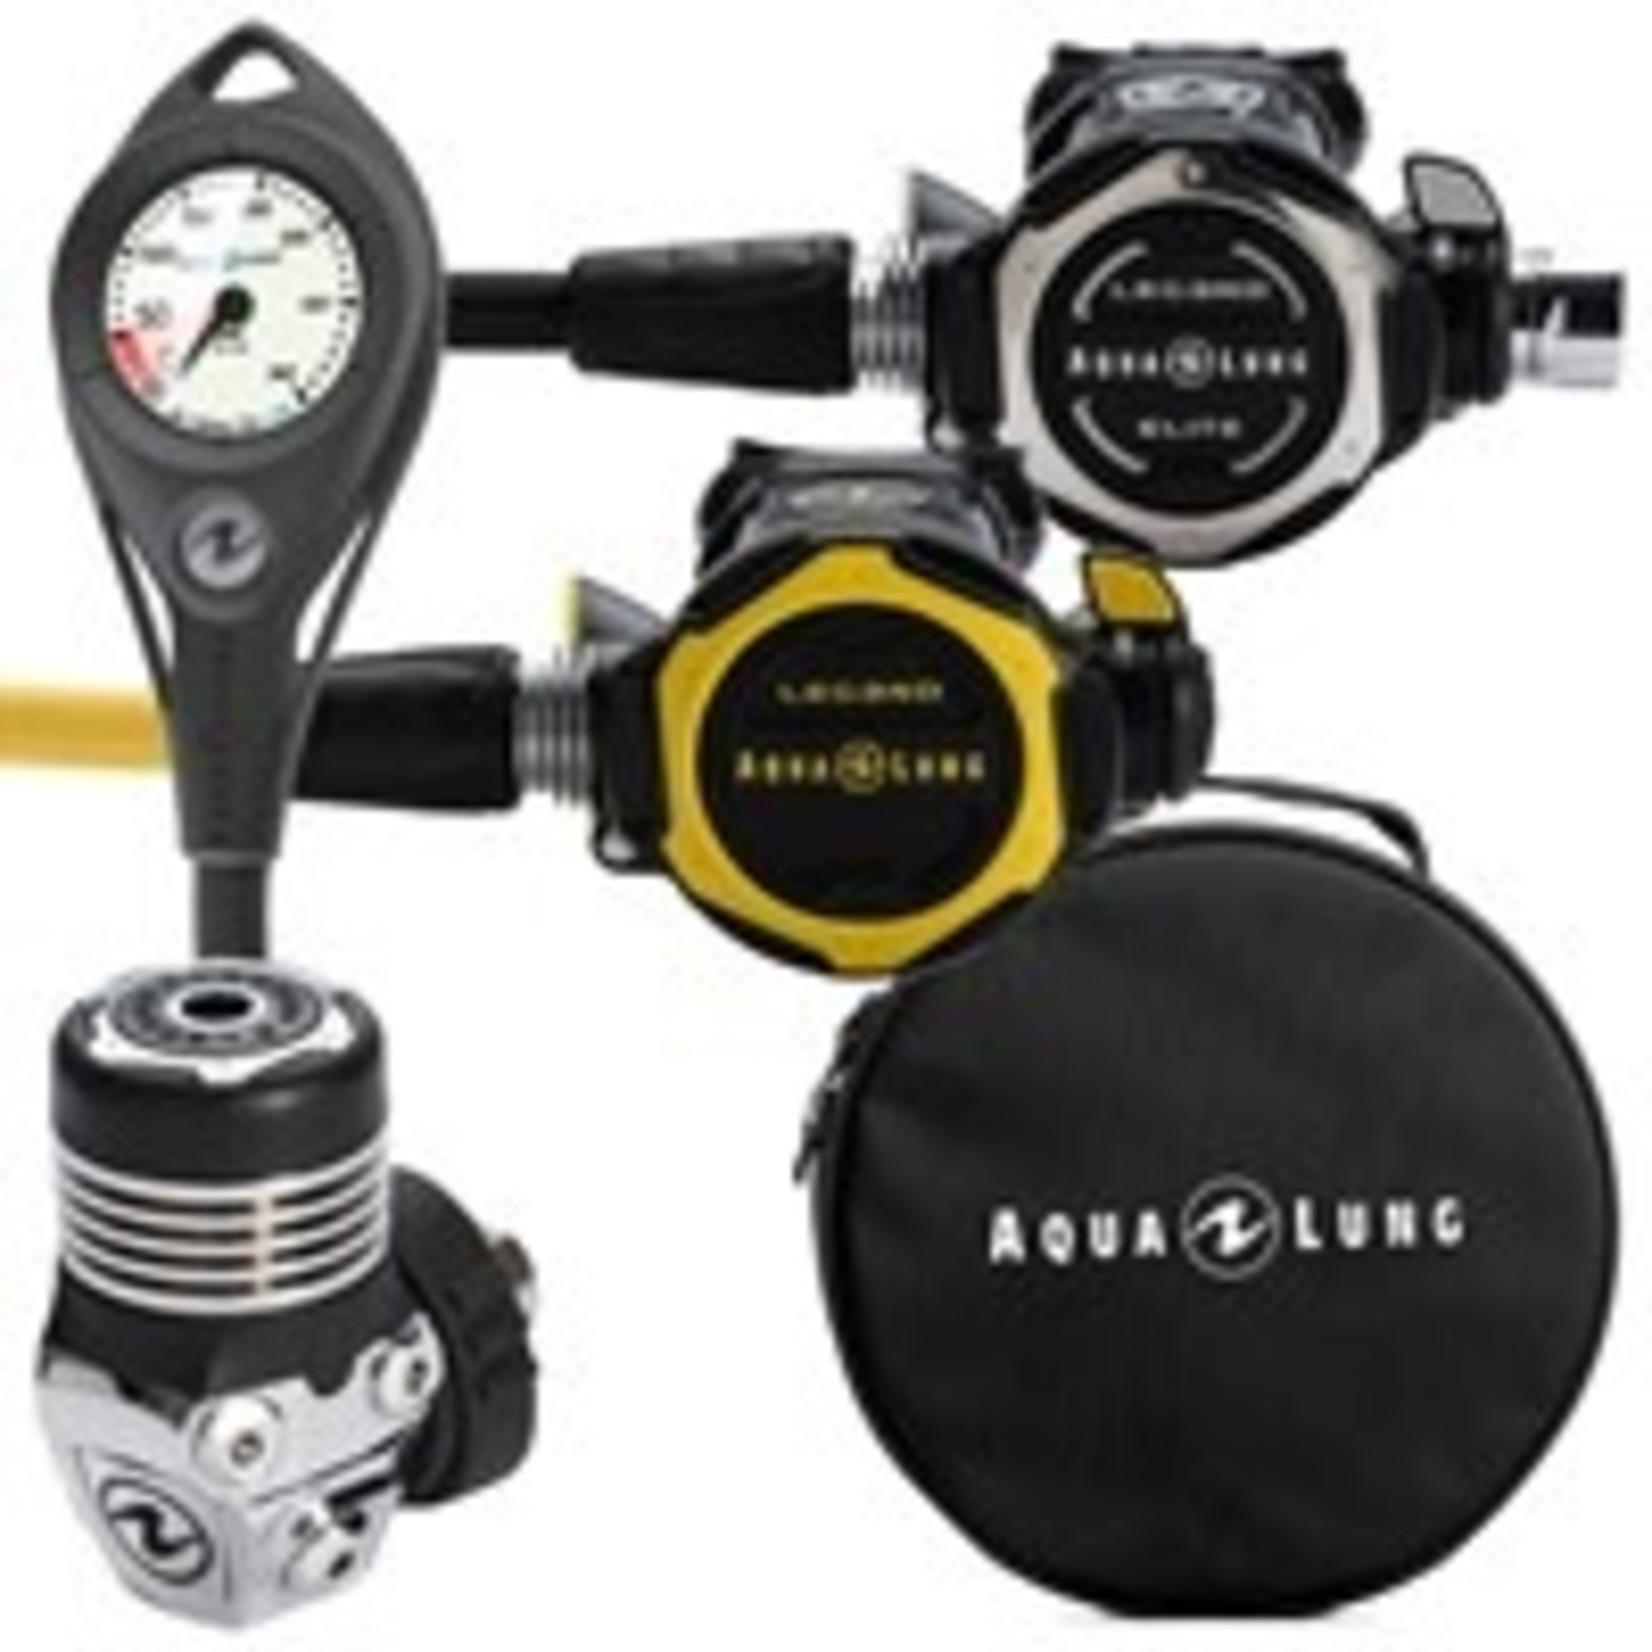 Aqua Lung Pack Leg3nd Elite DIN + Leg3nd Octopus + PG + Regulator Bag